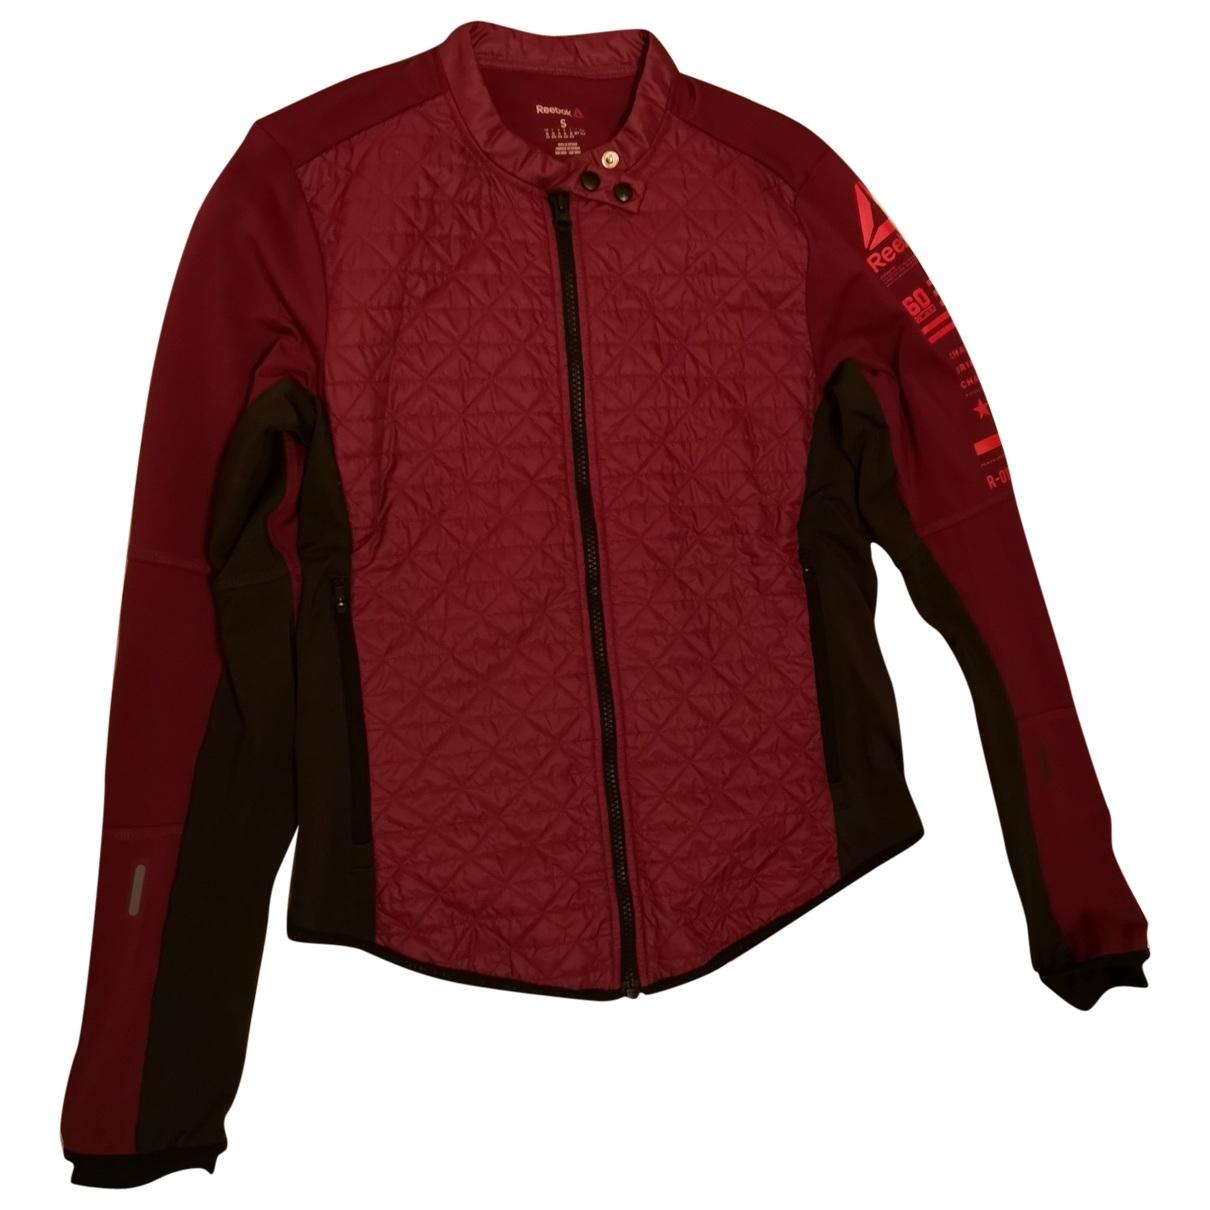 Reebok \N Burgundy jacket for Women S International